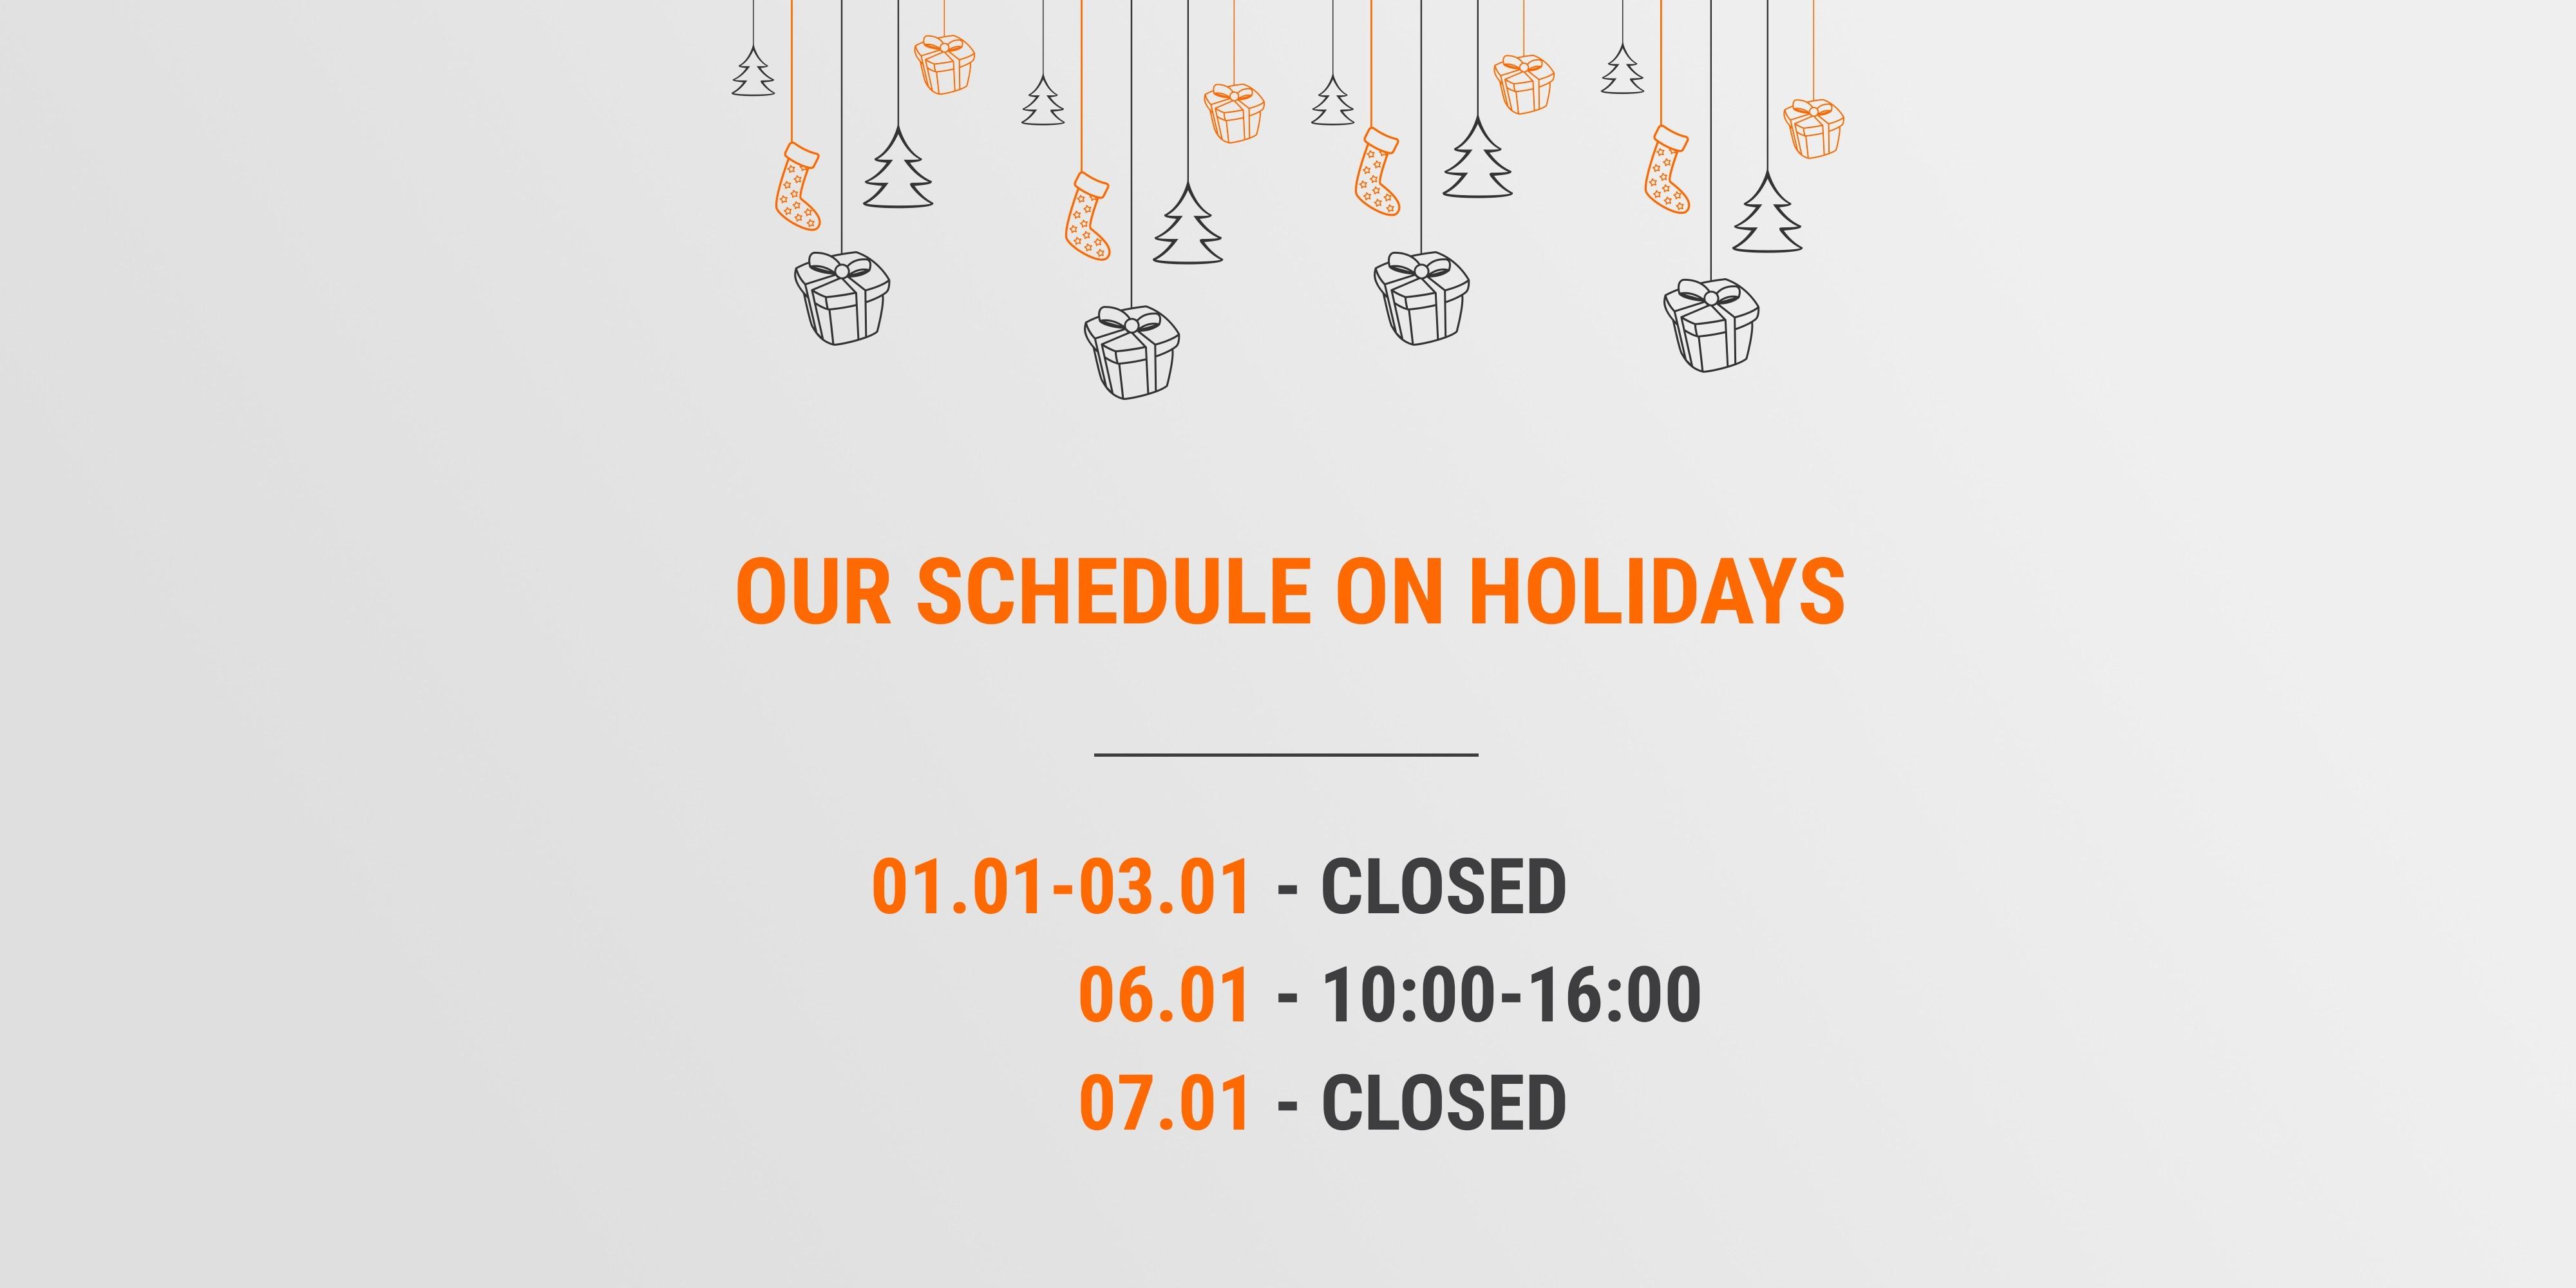 Work schedule on New Year holidays